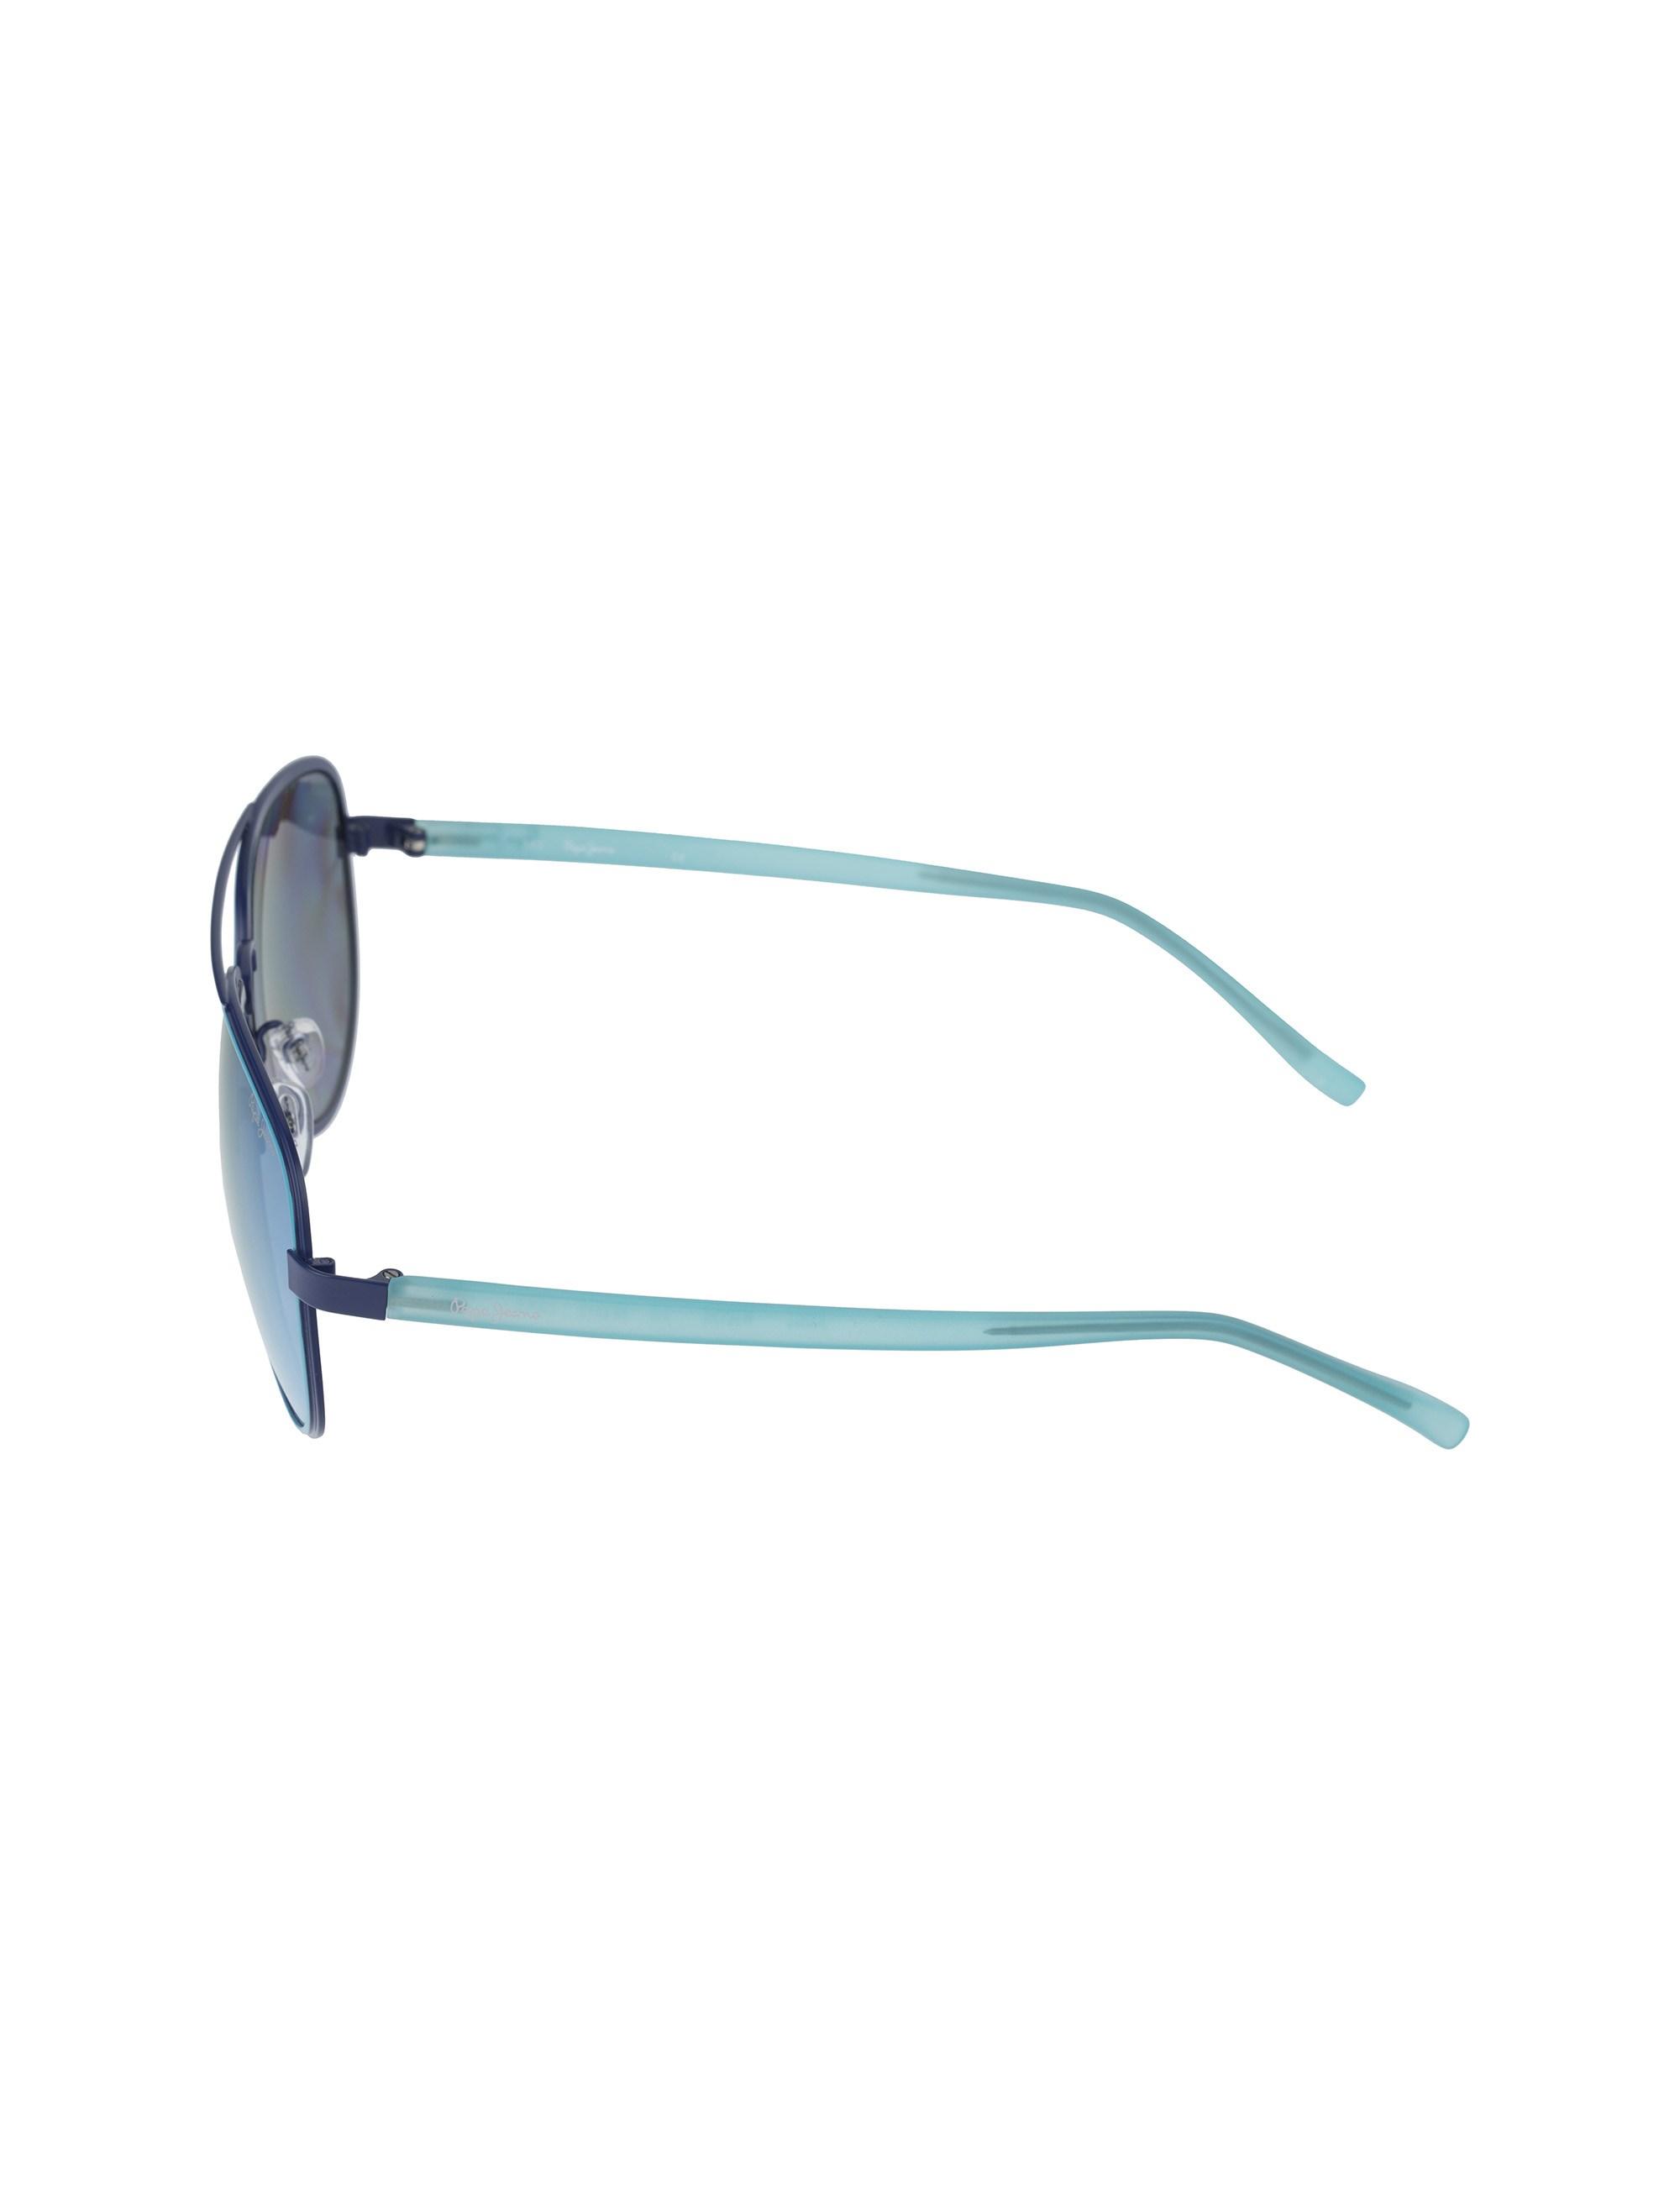 عینک آفتابی خلبانی زنانه - پپه جینز - آبي روشن - 3